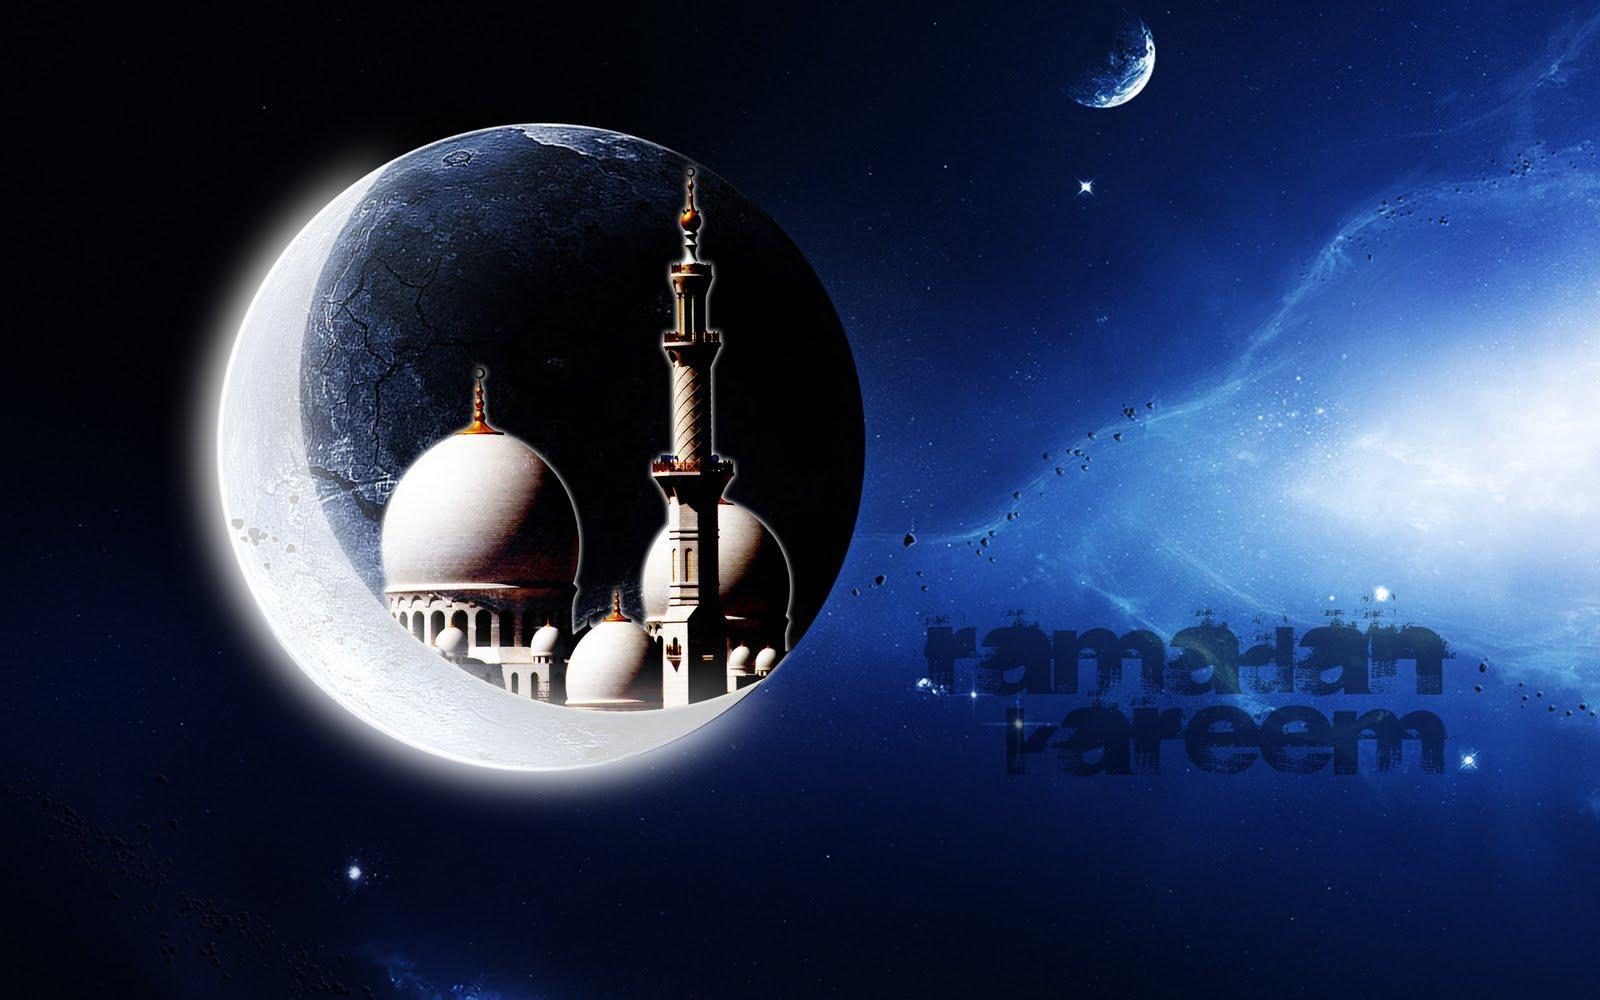 free download ramzan mubarak wallpapers 2014 - Islamic Wallpapers